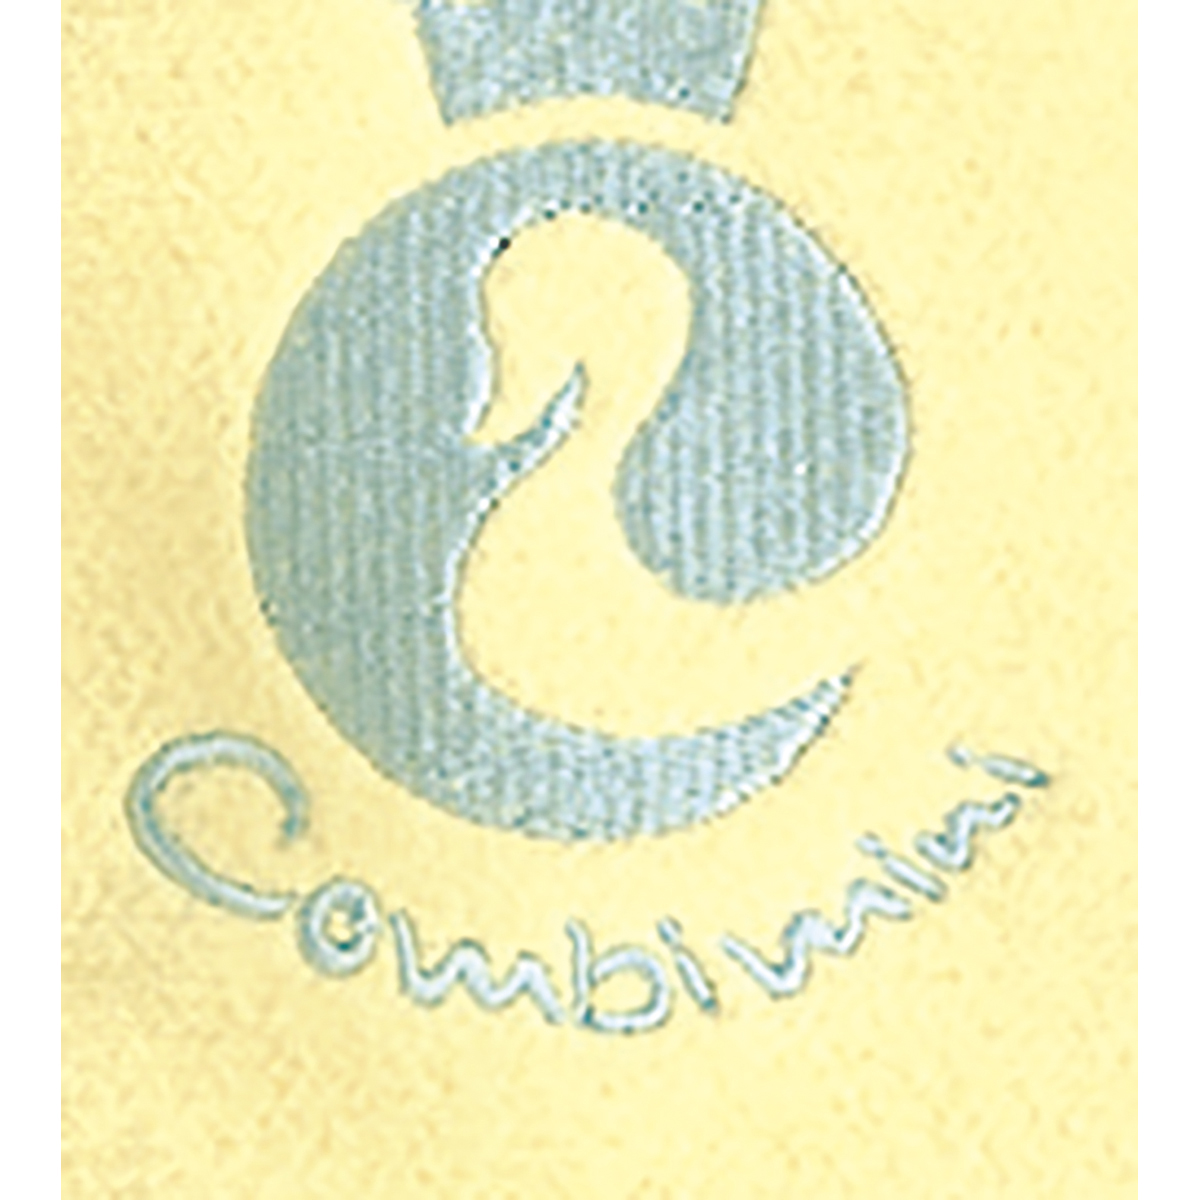 e0d769c490ffce 【Combimini コンビミニのベビー服/子供服】 綿毛布(スワン) 《コンビミニ》 ギフト ベビー布団 出産祝い Combi mini 新生児  ベビーふとん 秋冬 男の子 女の子_blp